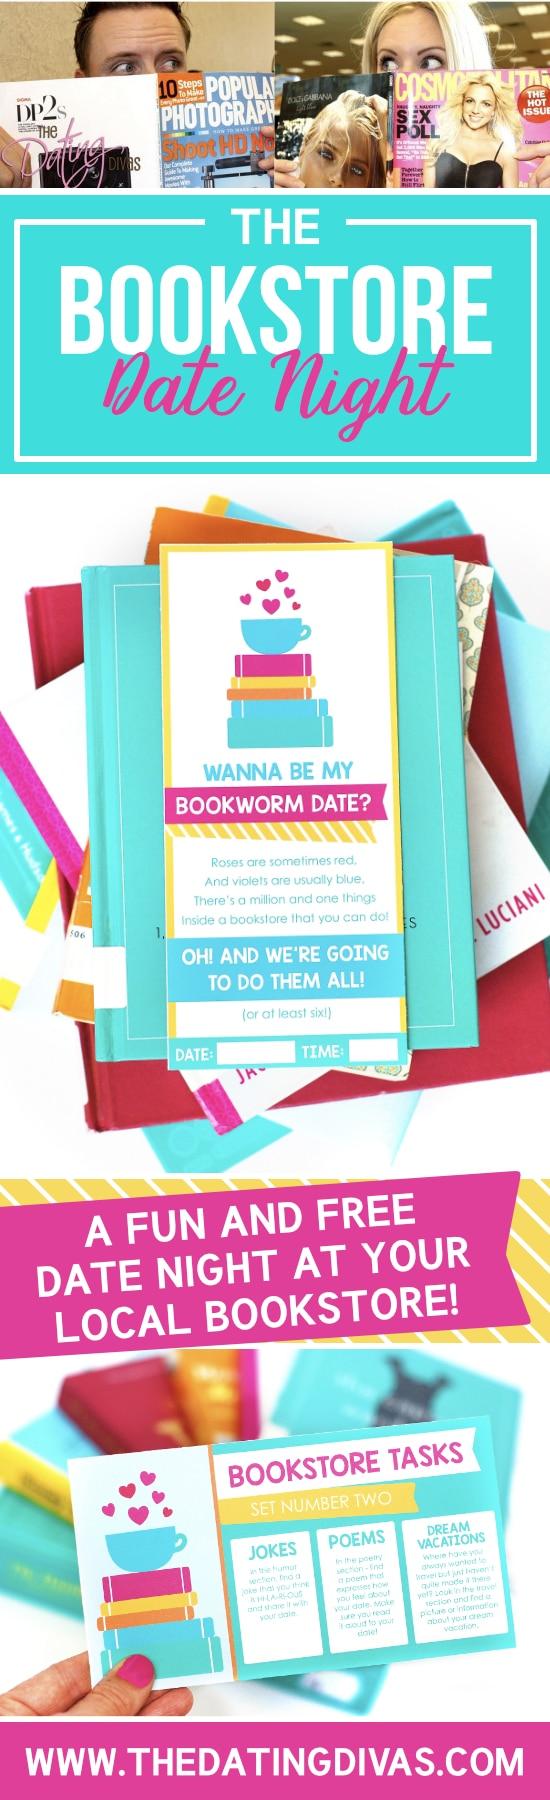 The Bookstore Date Night